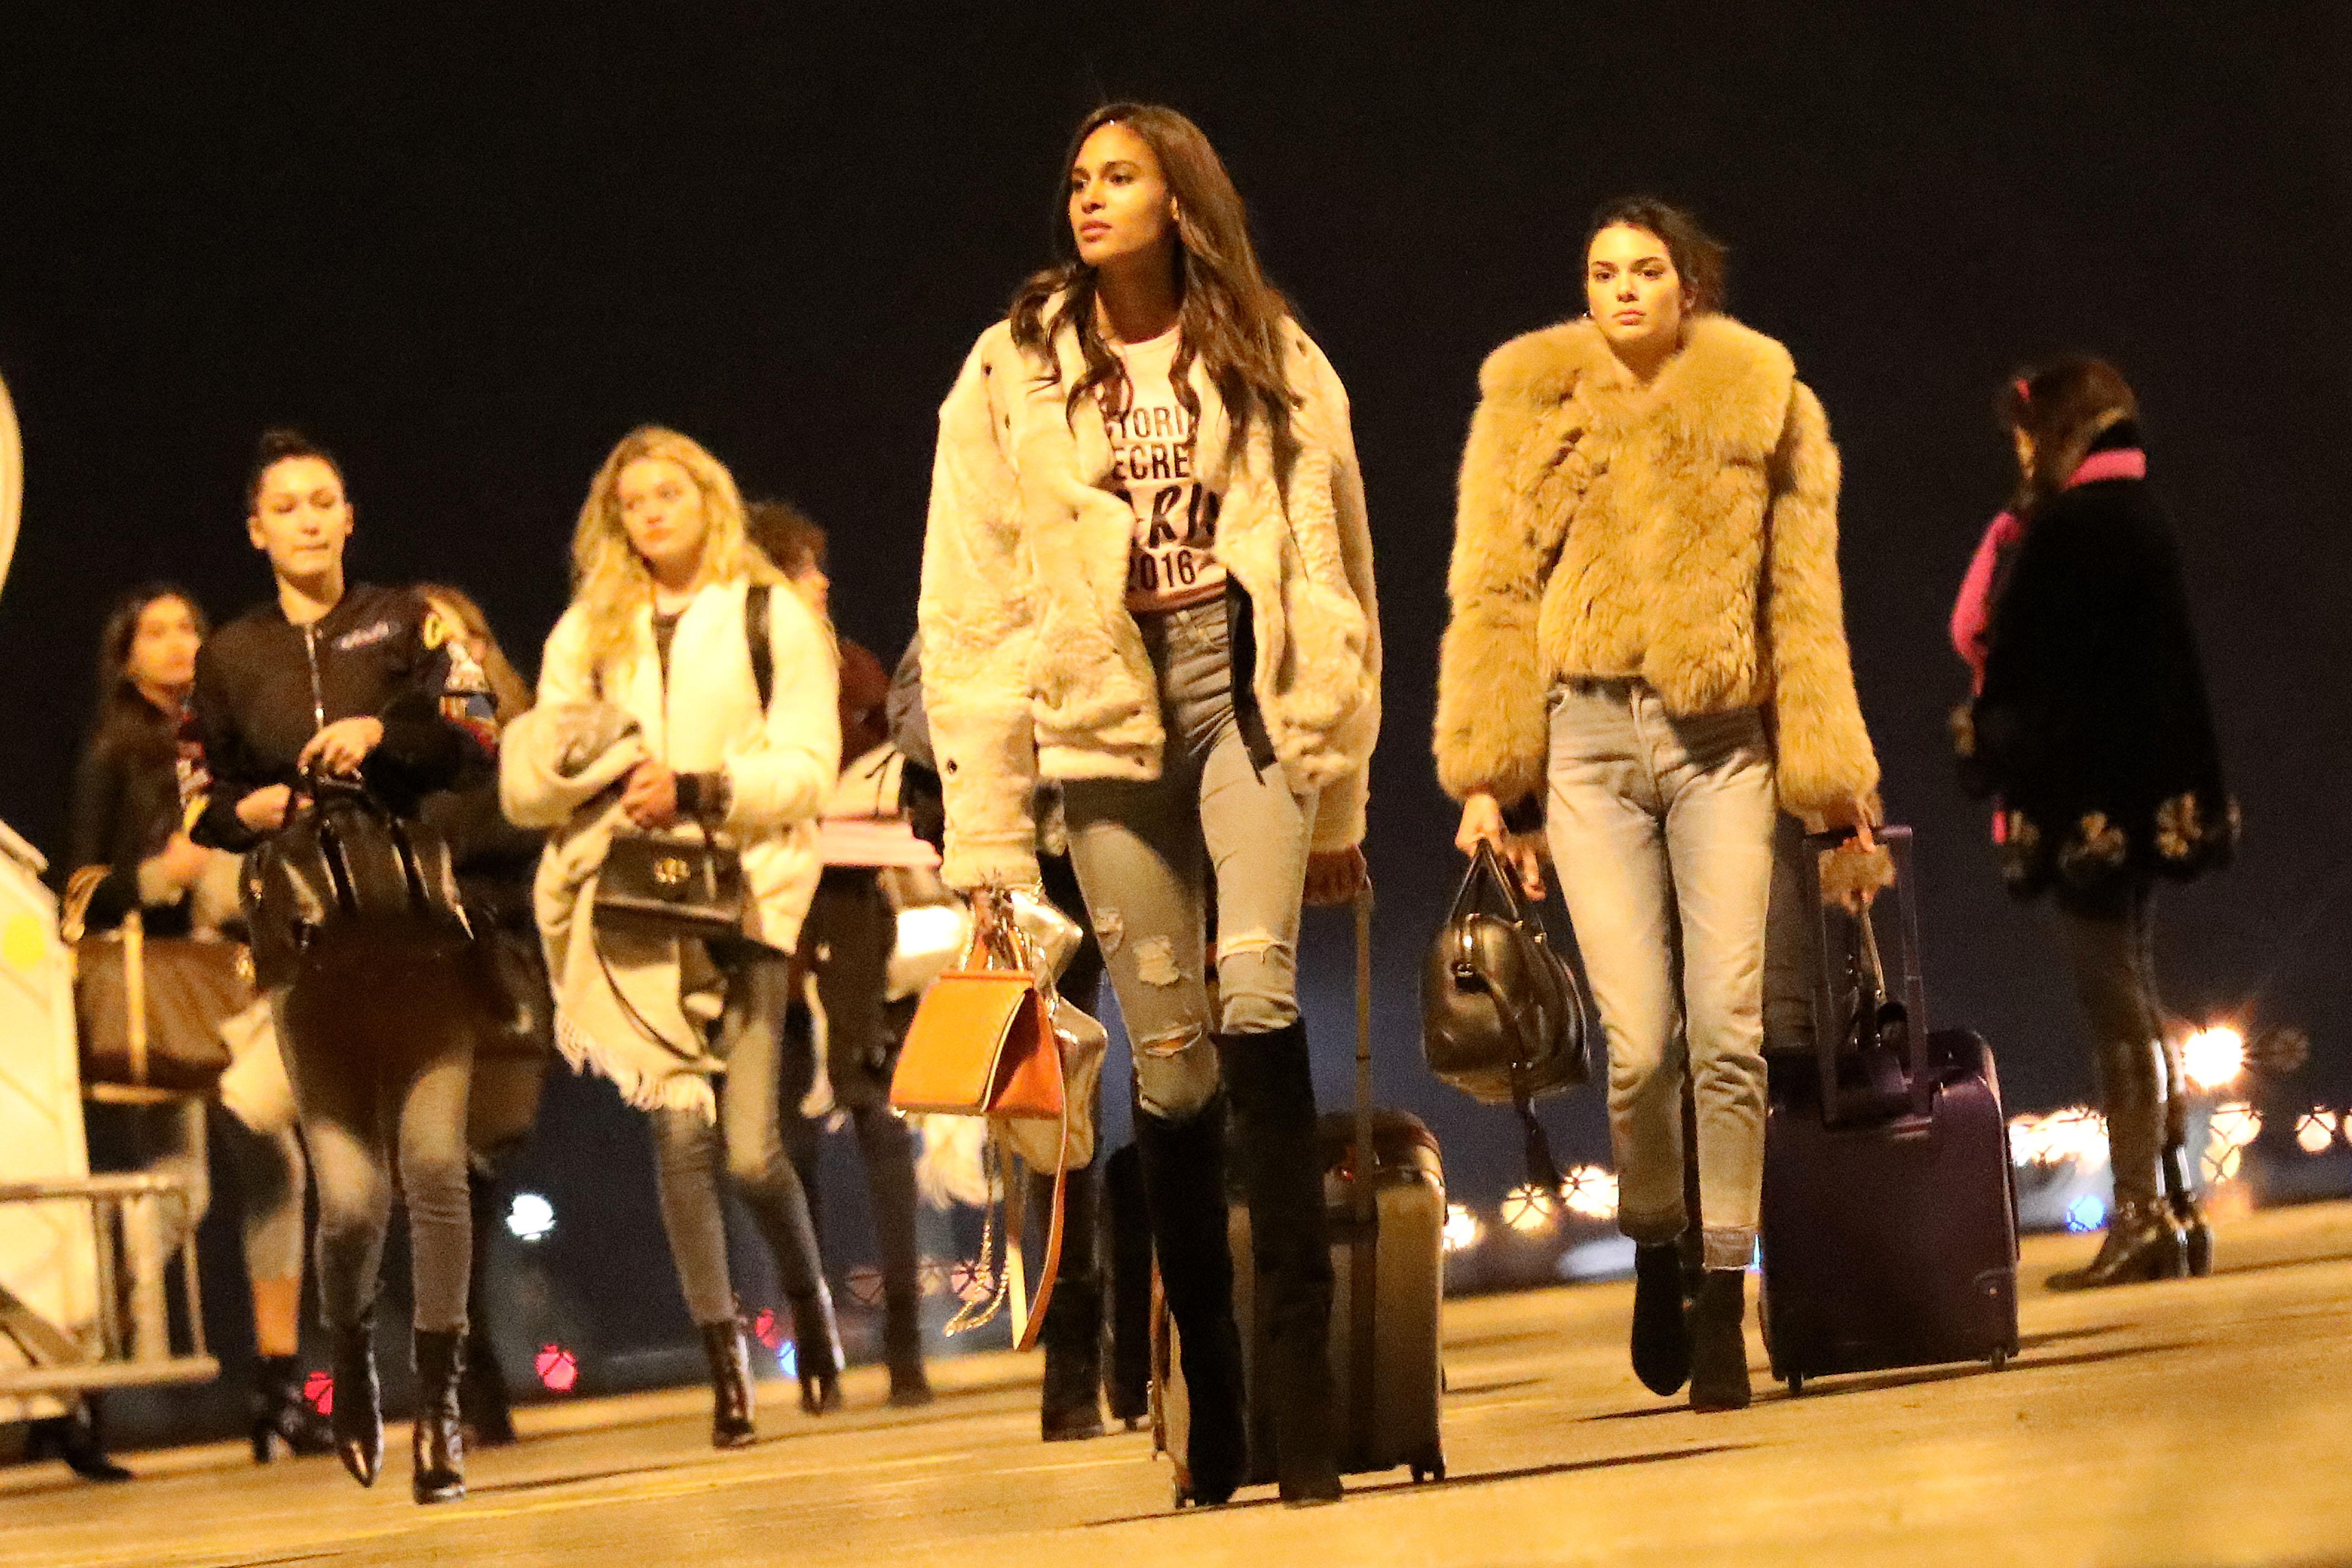 The Victoria's Secret Angels arrive in Paris. (Photo credit: Splash News)